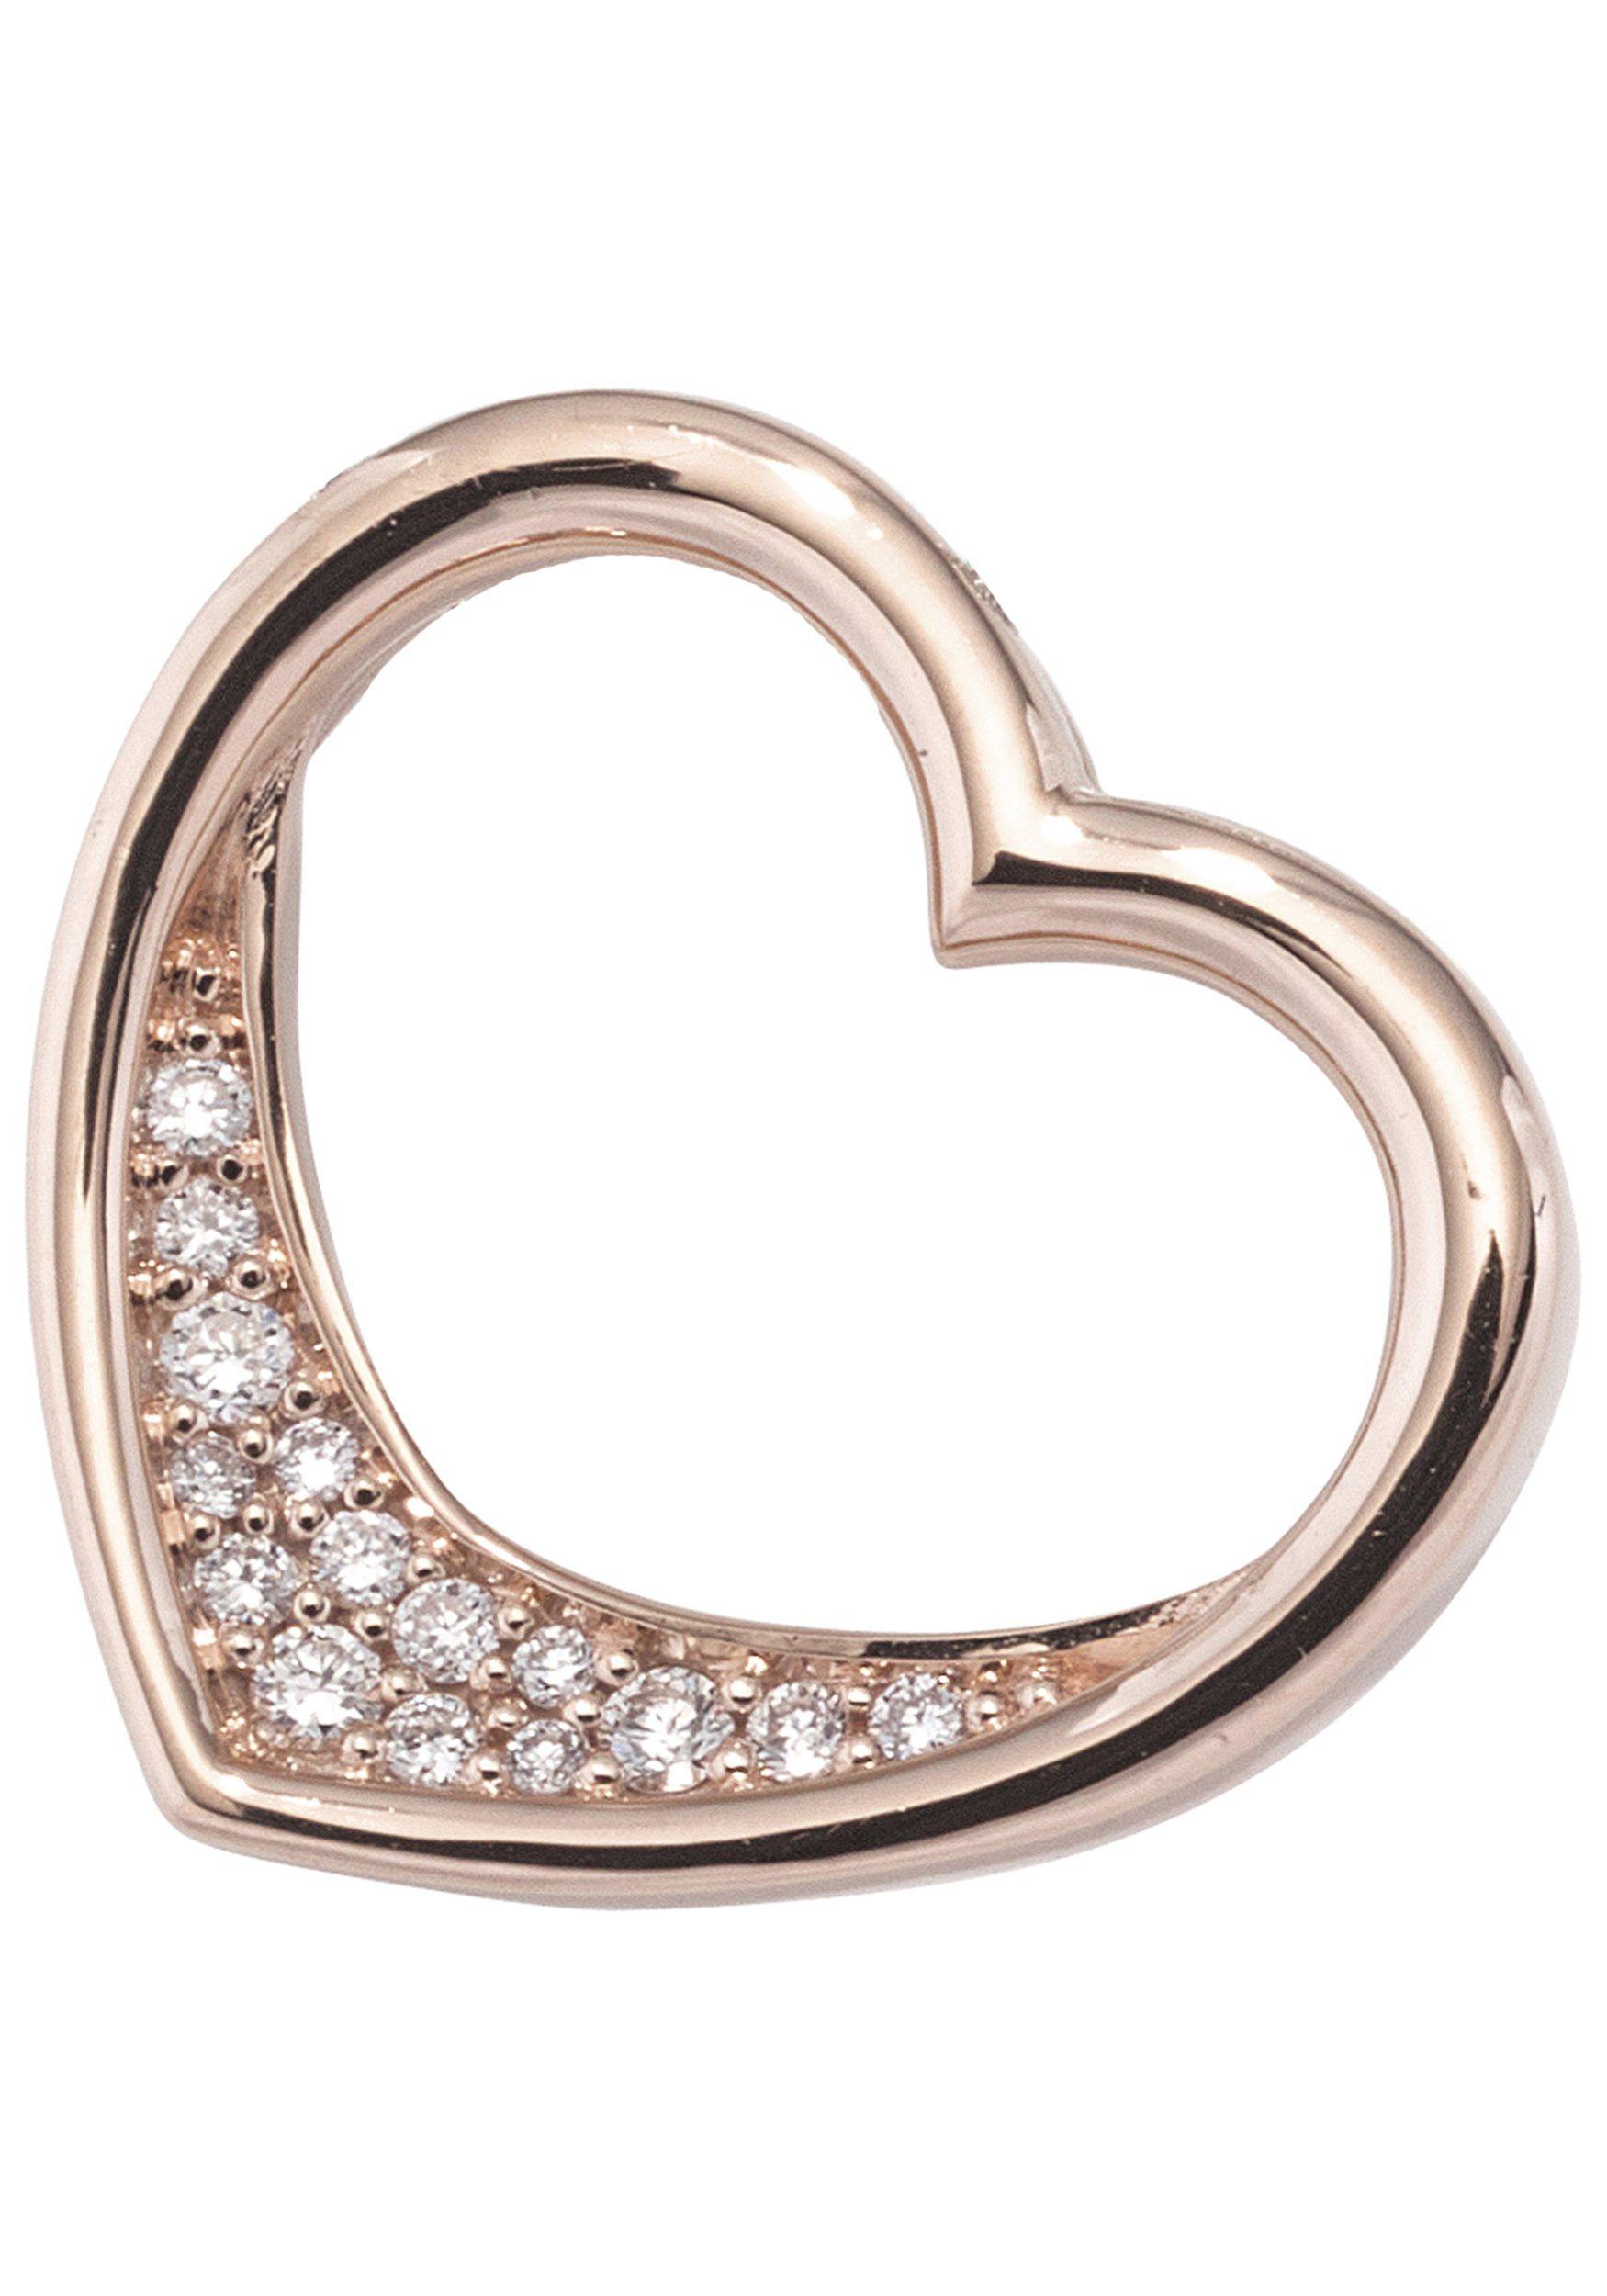 JOBO Herzanhänger »Herz« 585 Roségold mit 15 Diamanten | Schmuck > Halsketten > Herzketten | Si | JOBO